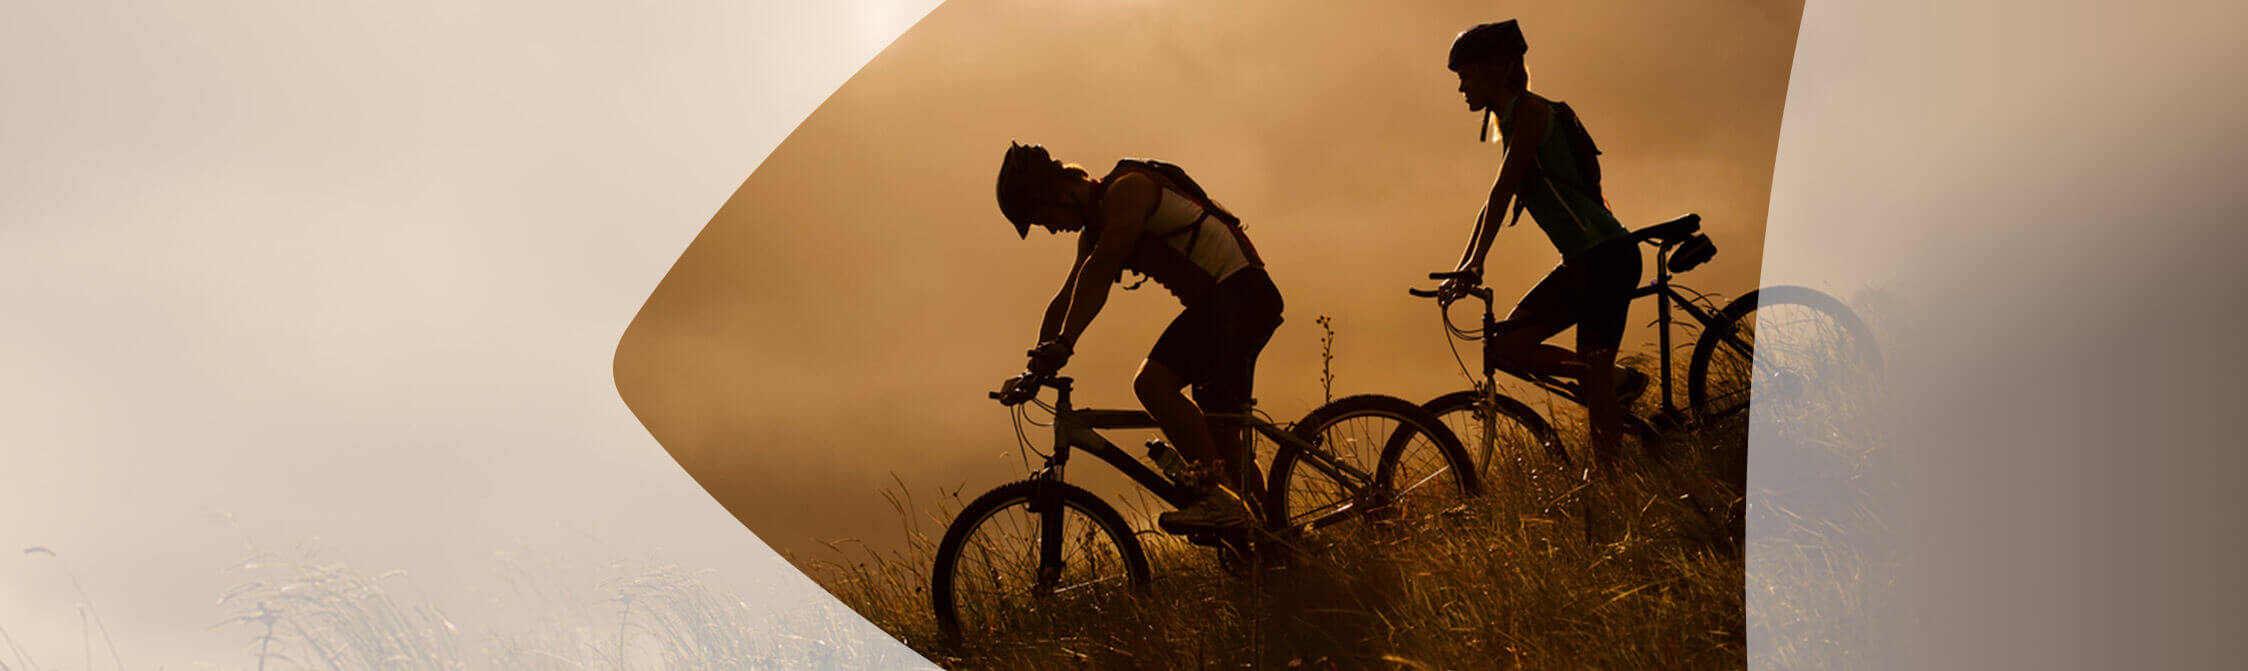 Couple biking downhill